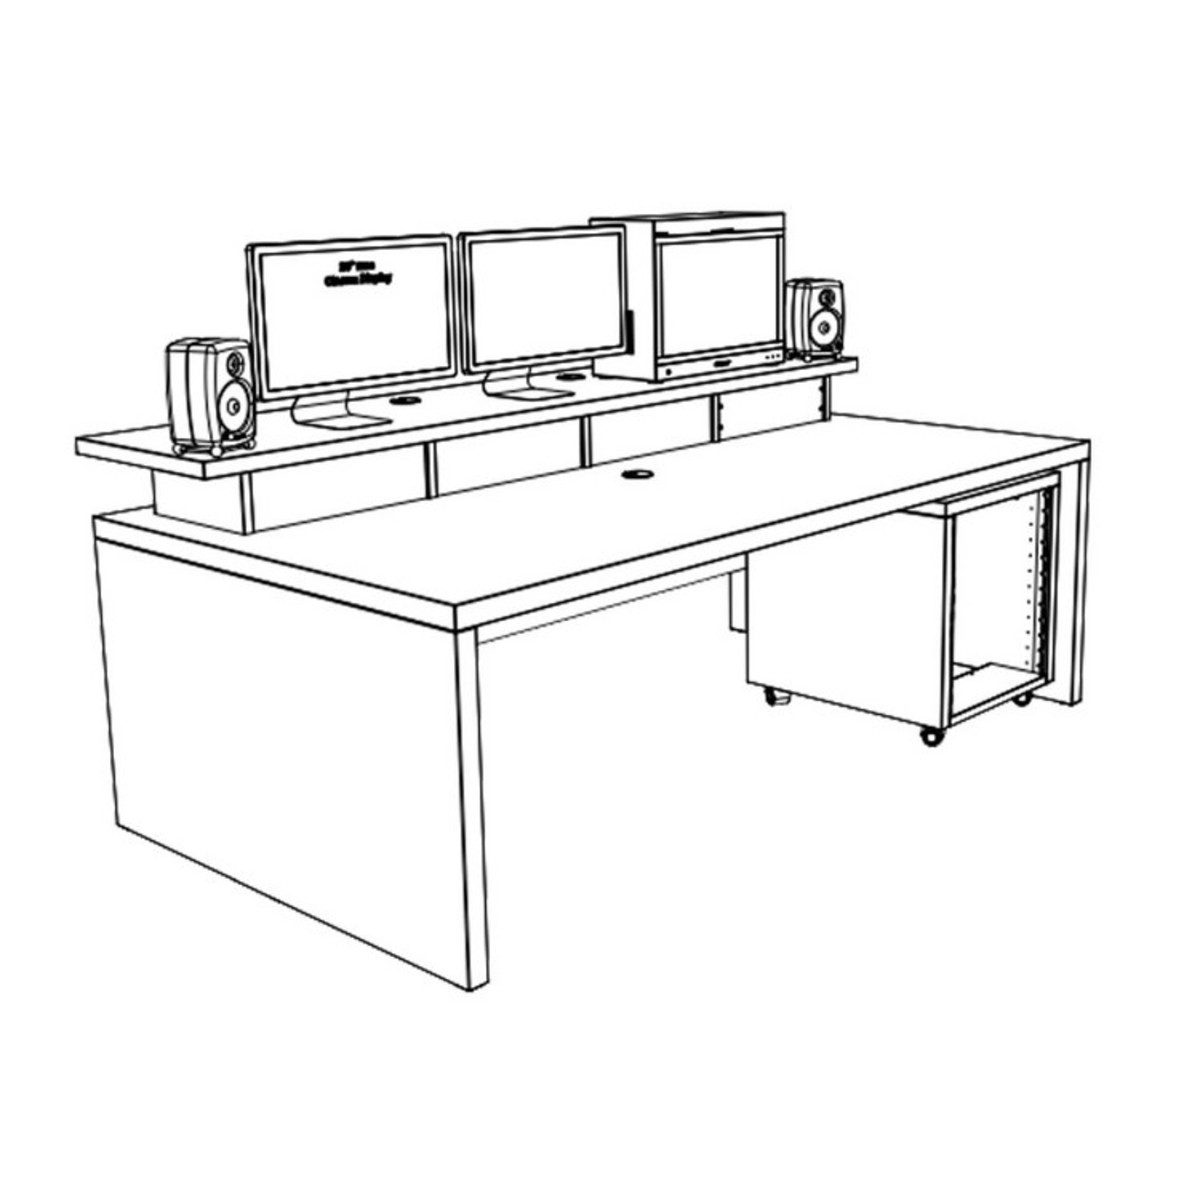 offline wei meine gro en schreibtisch xtra grosse tafel 12he 12u rack und oberen racks auf. Black Bedroom Furniture Sets. Home Design Ideas